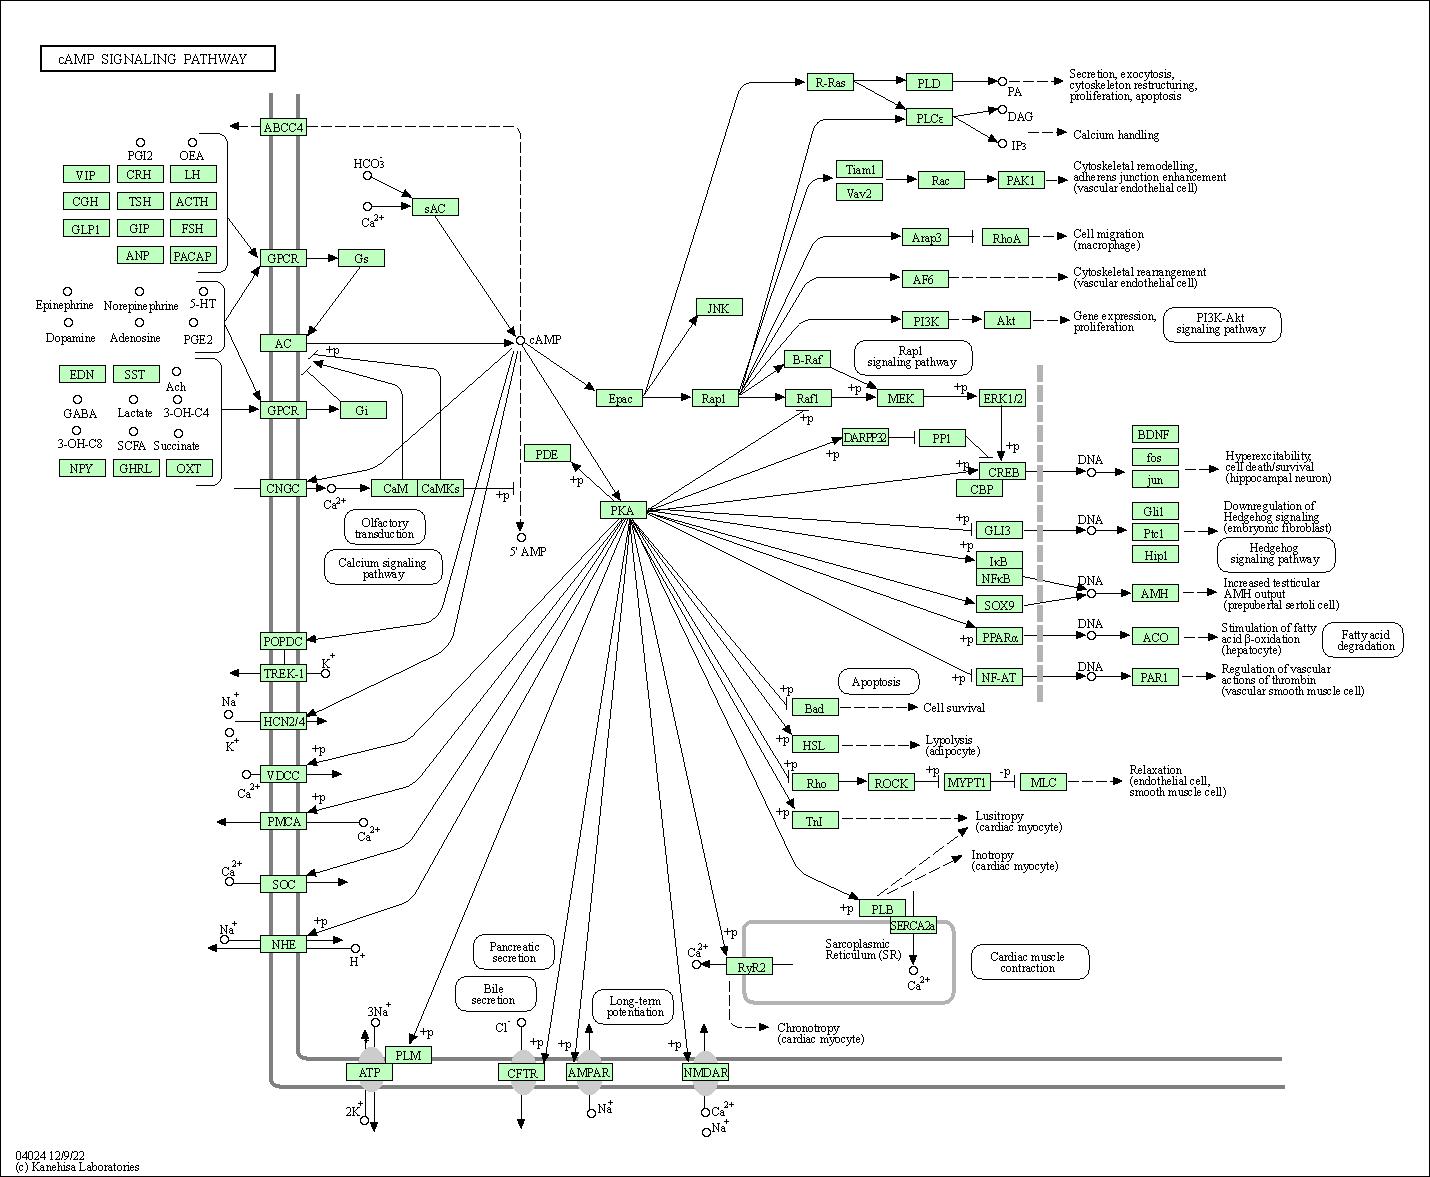 gpcr activation pathway